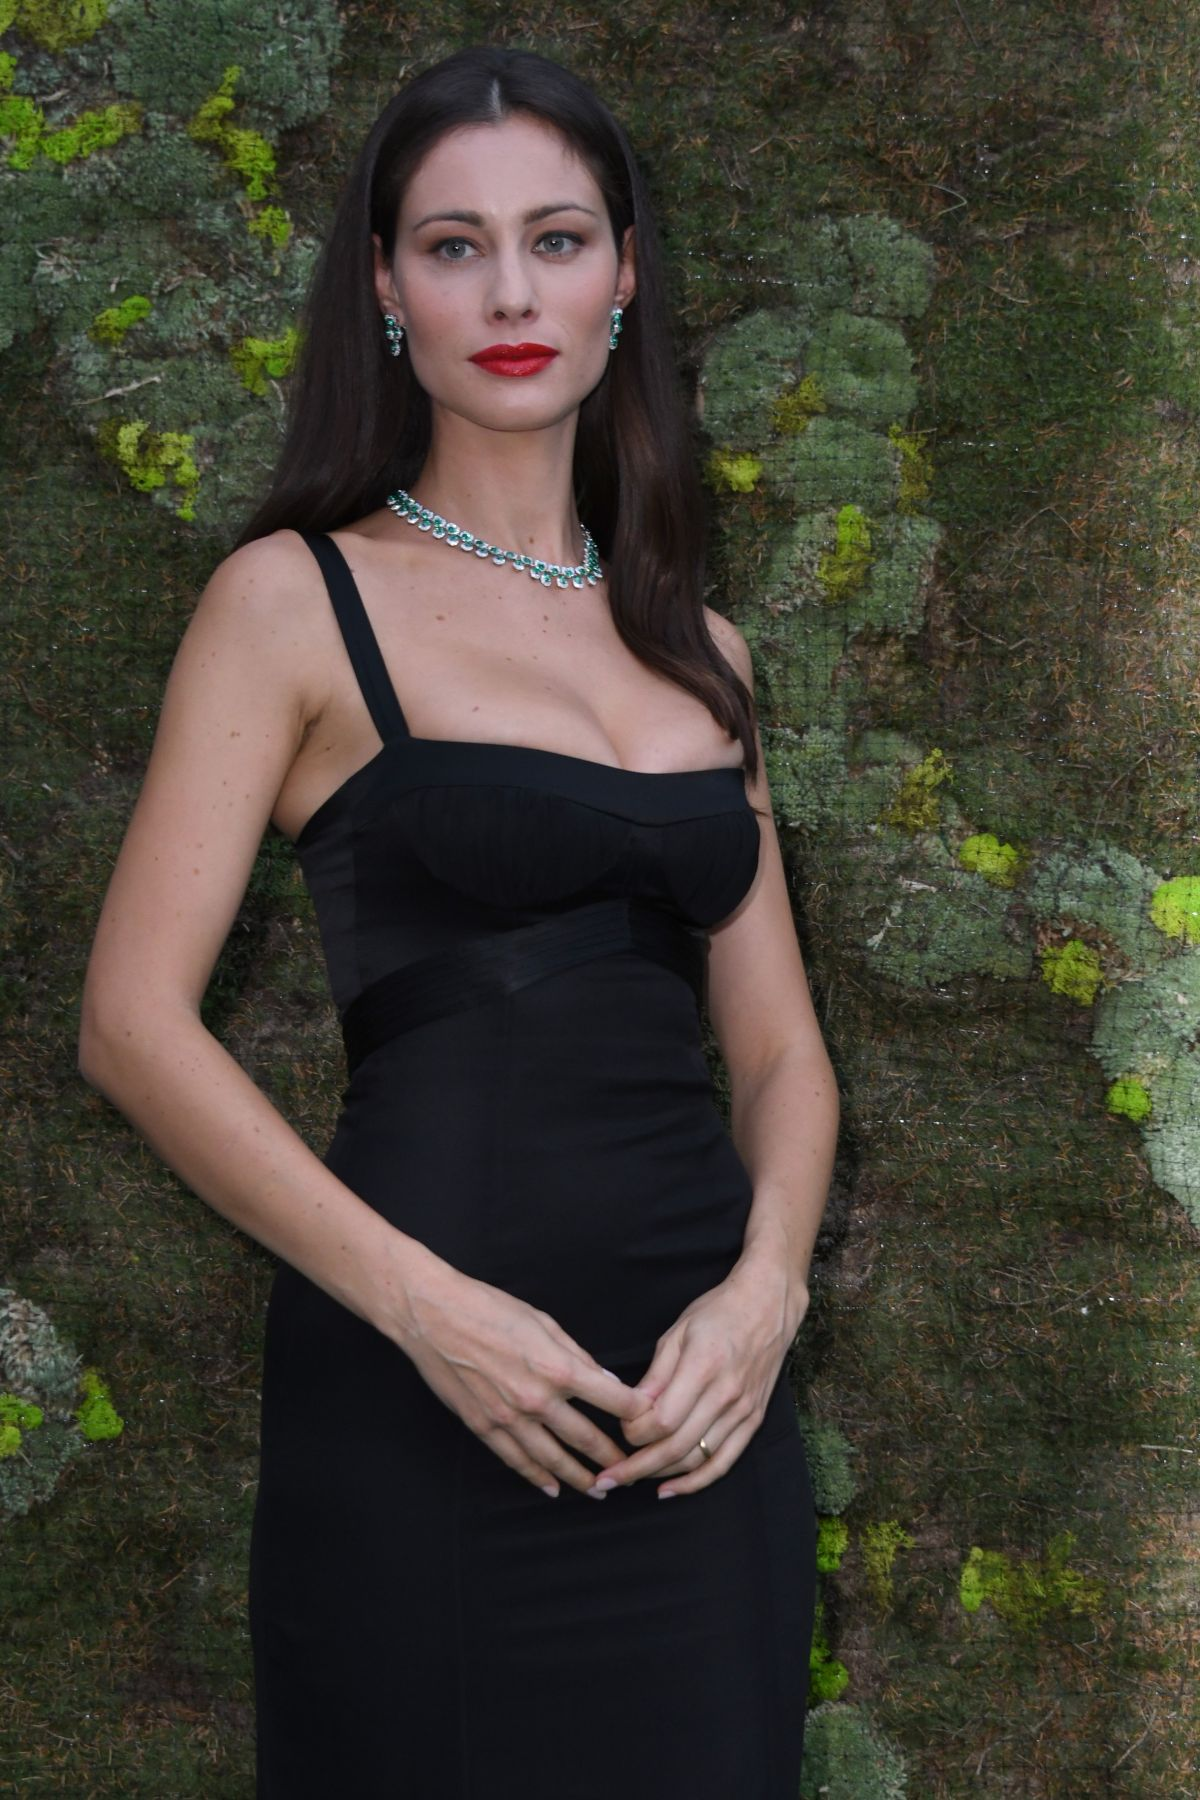 Celebrites Marica Pellegrinelli naked (44 photo), Sexy, Sideboobs, Feet, panties 2017